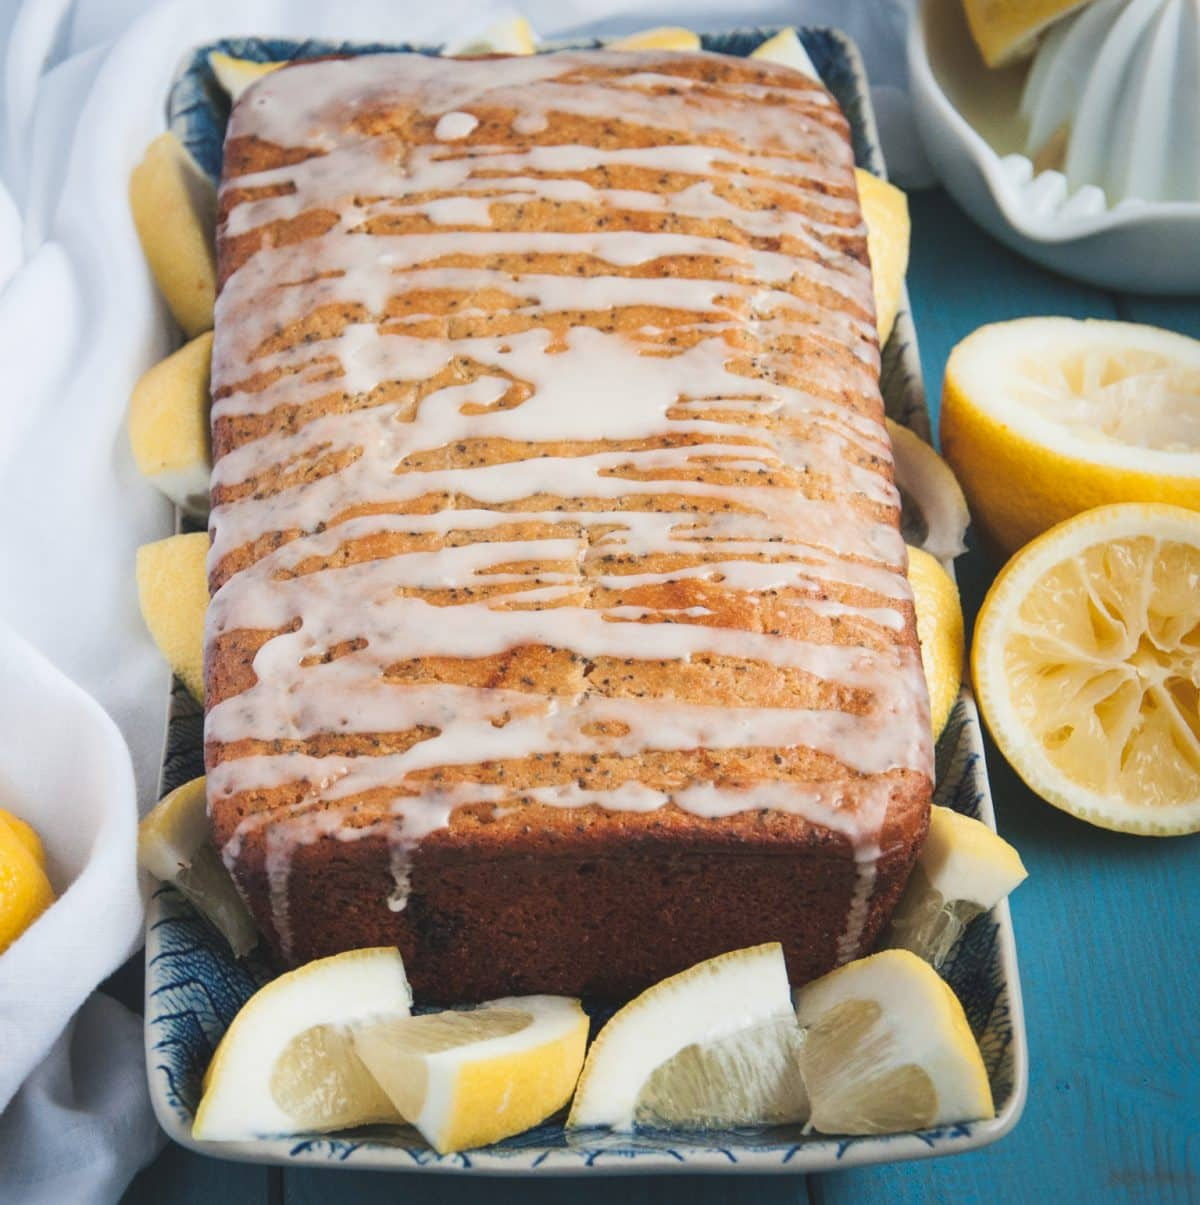 Whole wheat lemon poppy seed bread with glaze